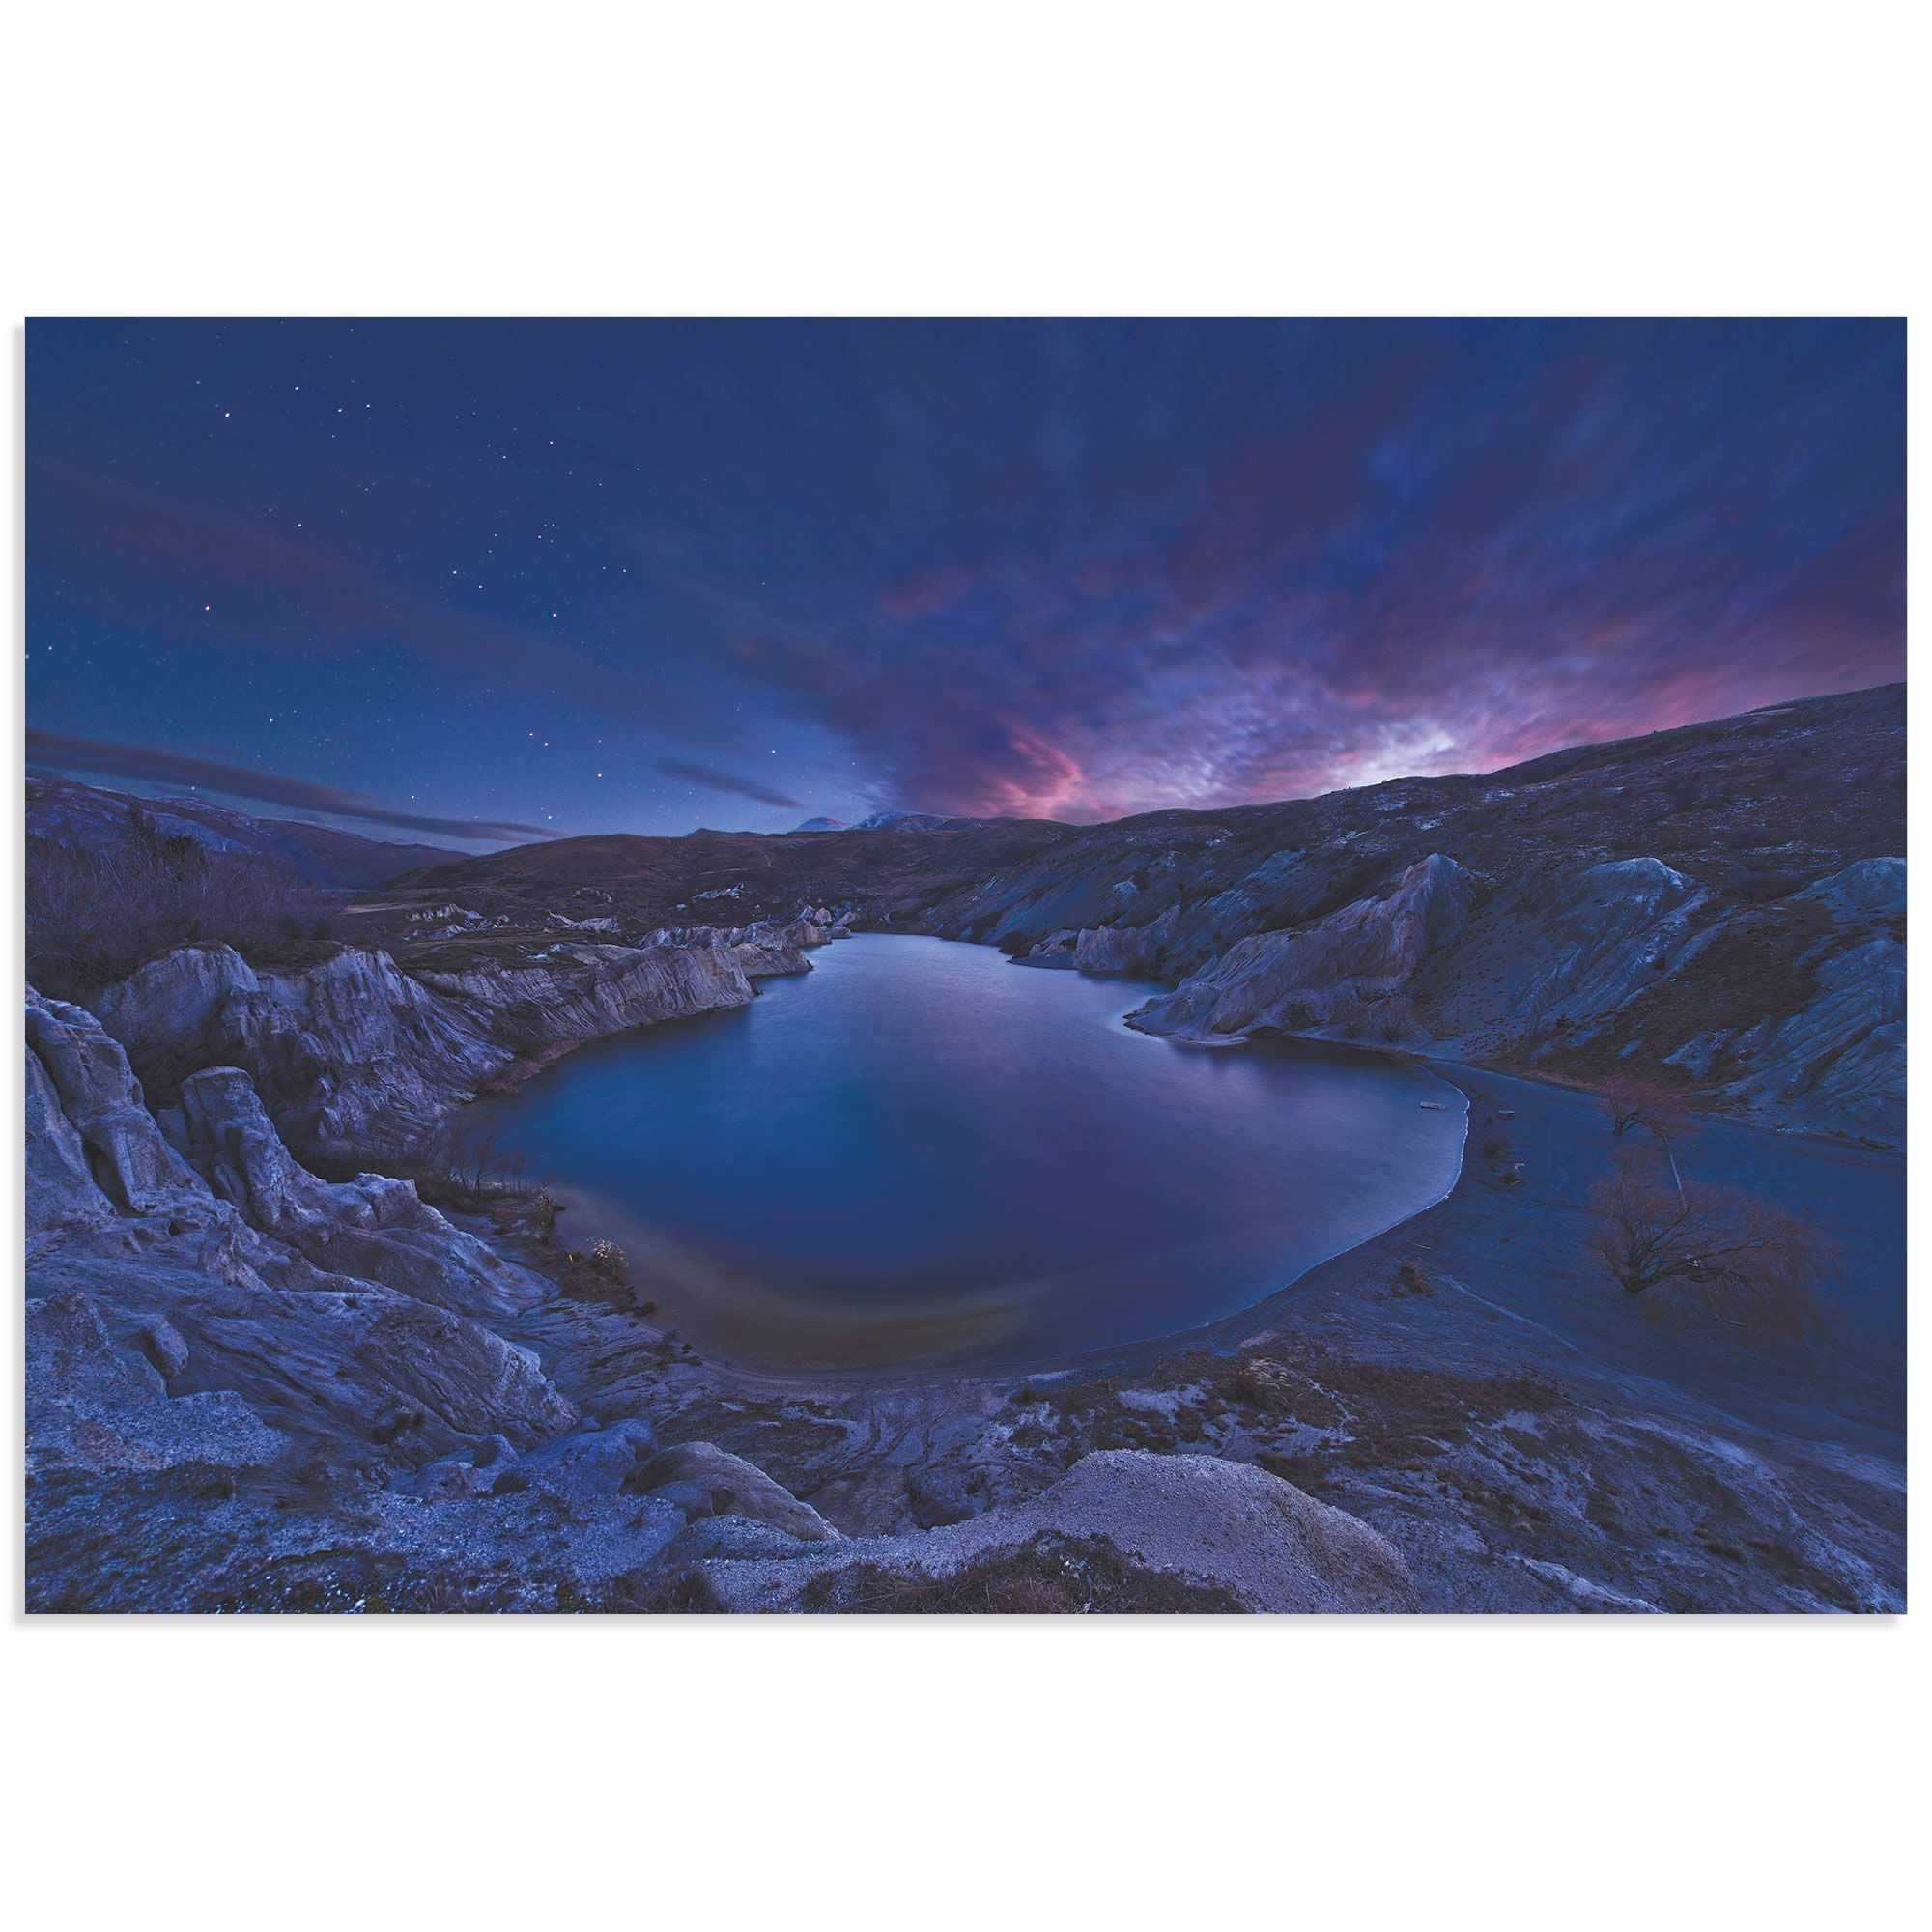 Blue Lake by Yan Zhang - Water Art on Metal or Acrylic